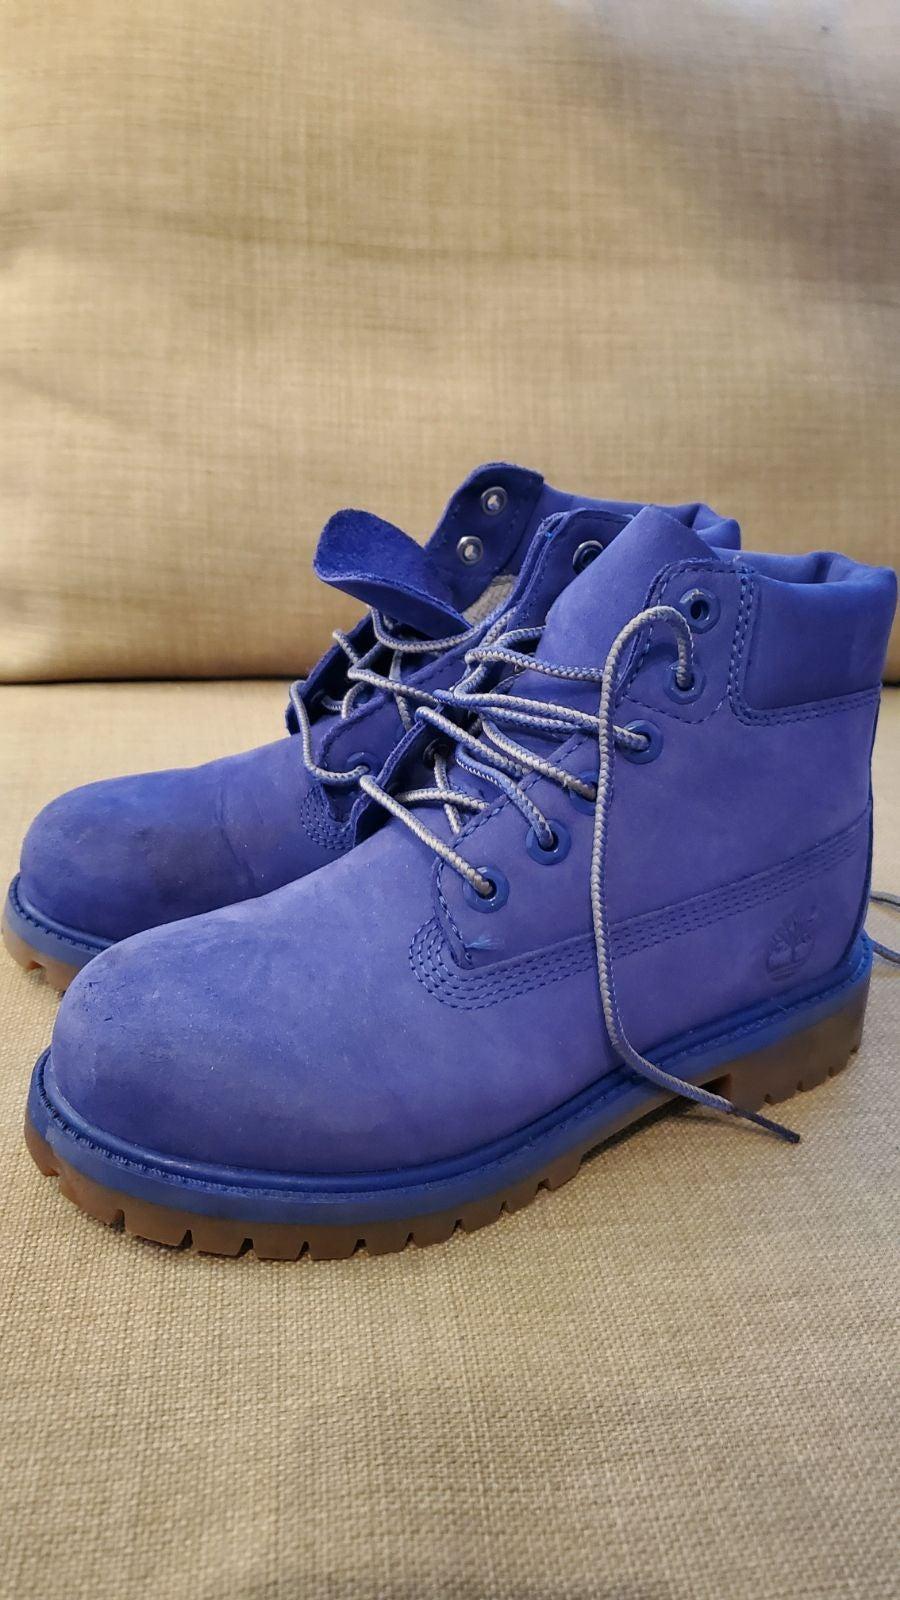 Timberland Boy Premium Blue Boot. Size 1